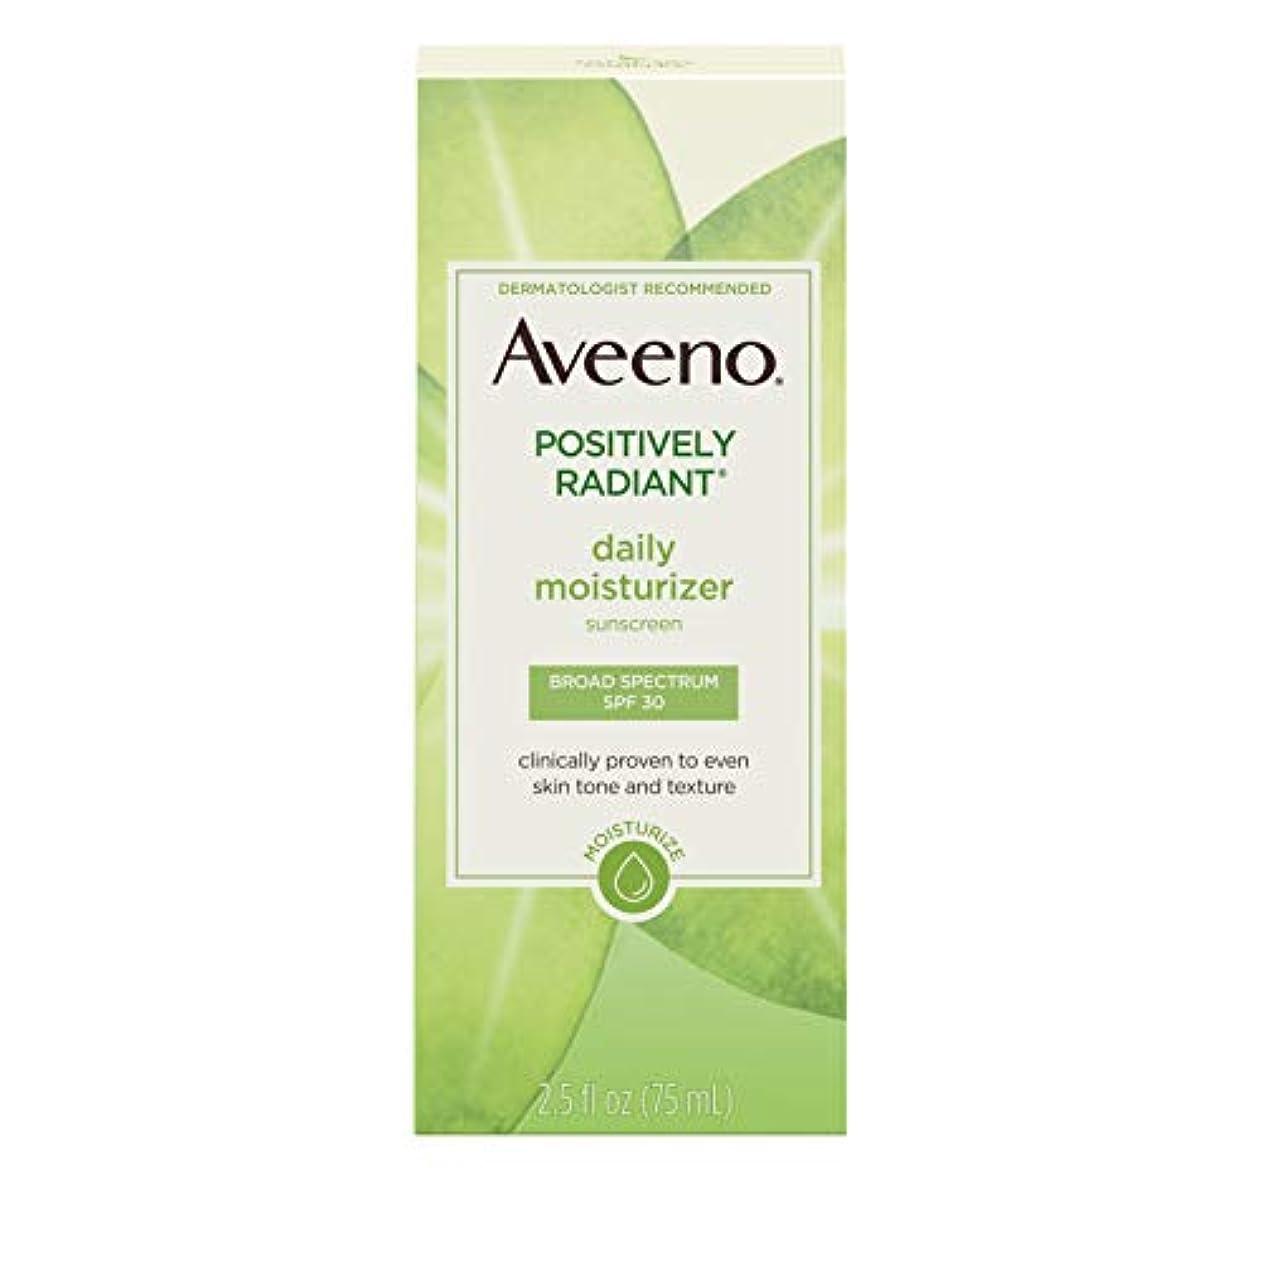 Aveeno Active Naturals Positively Radiant Daily Moisturizer SPF-30 UVA/UVB Sunscreen 73 ml